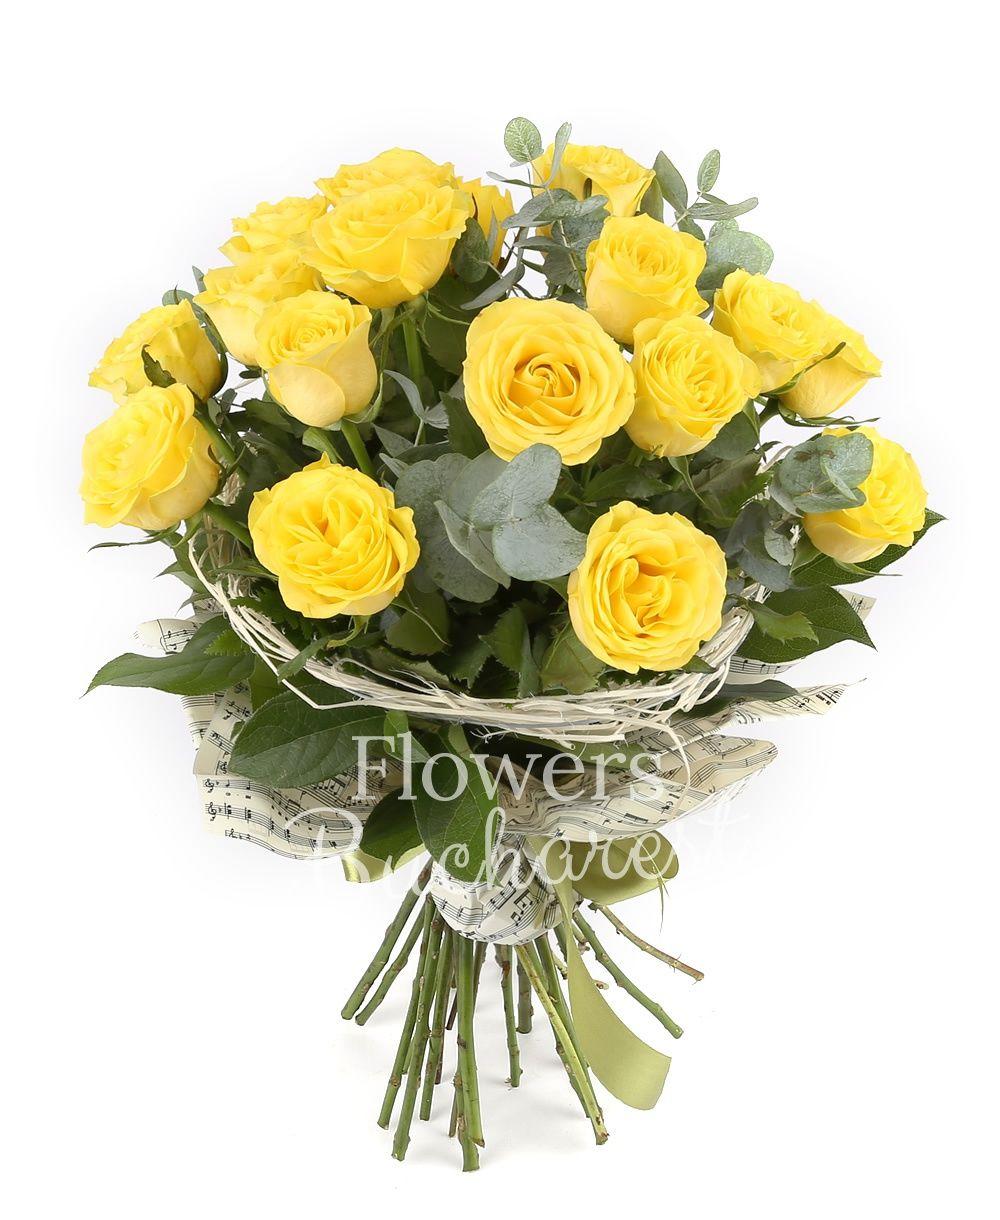 17 yellow roses, greenery